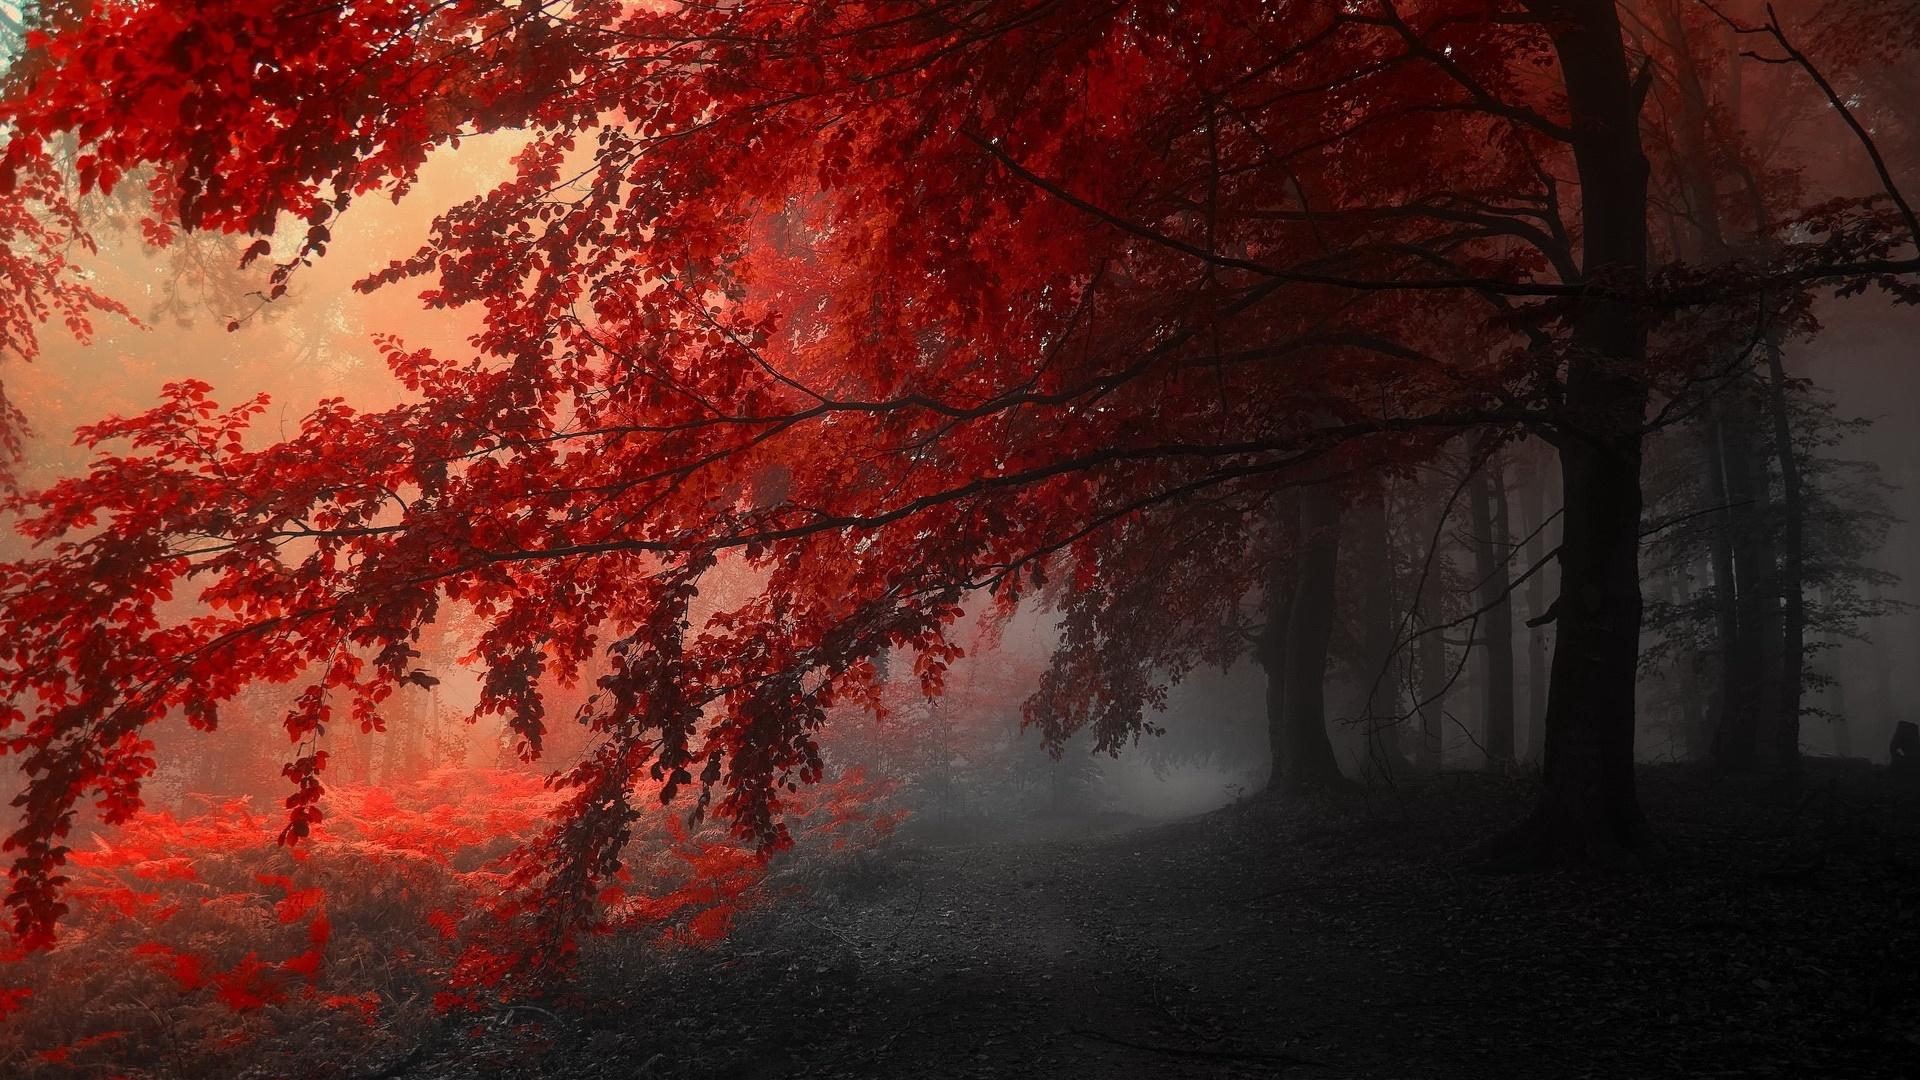 Dark Autumn Wallpaper